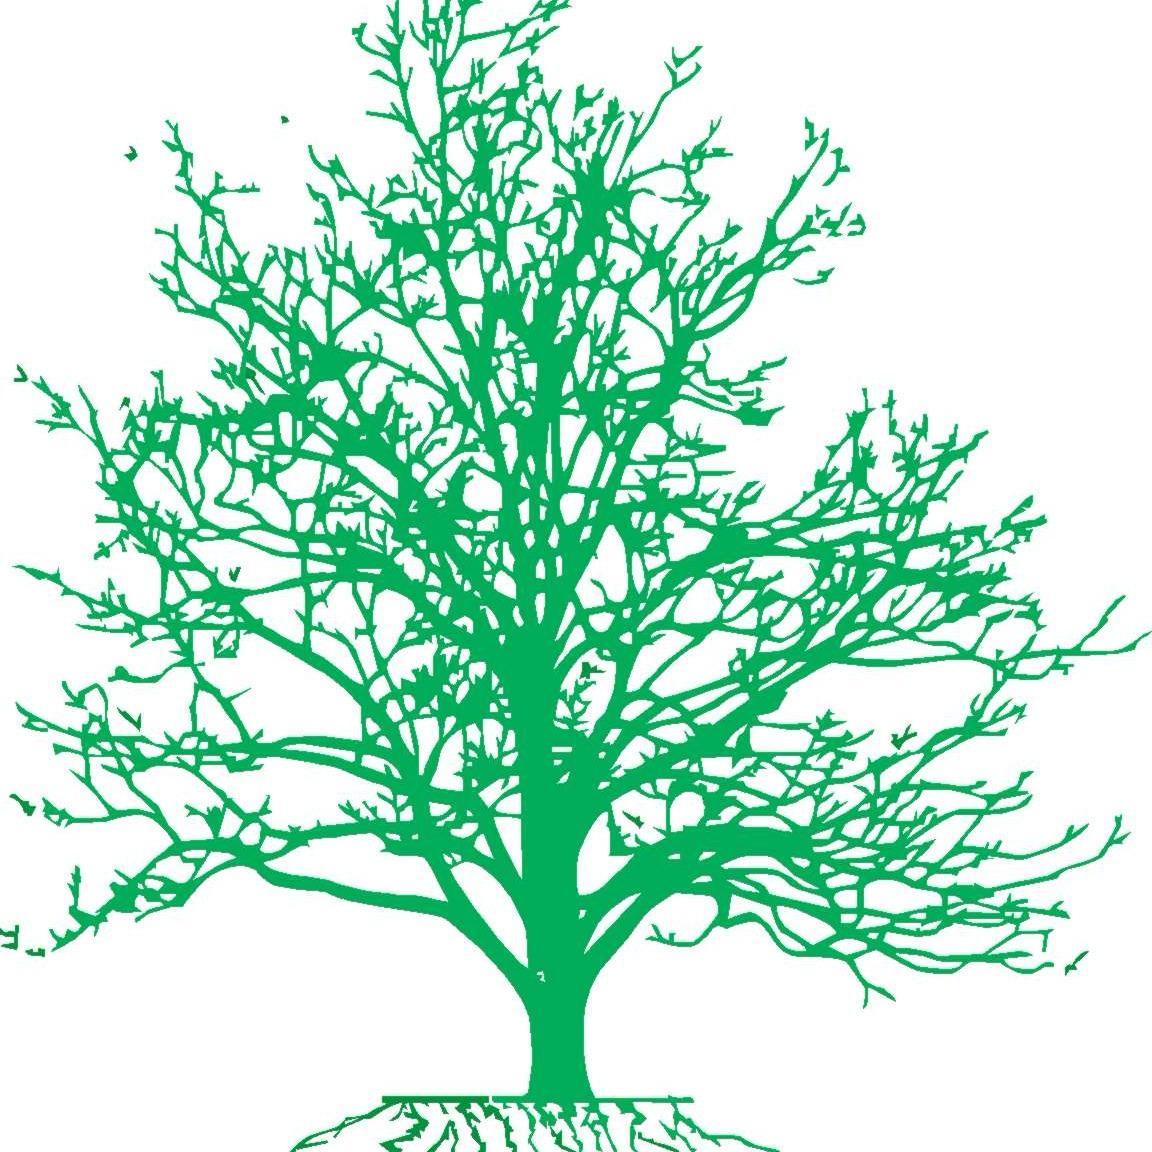 Brummer's Tree and Shrub LLC